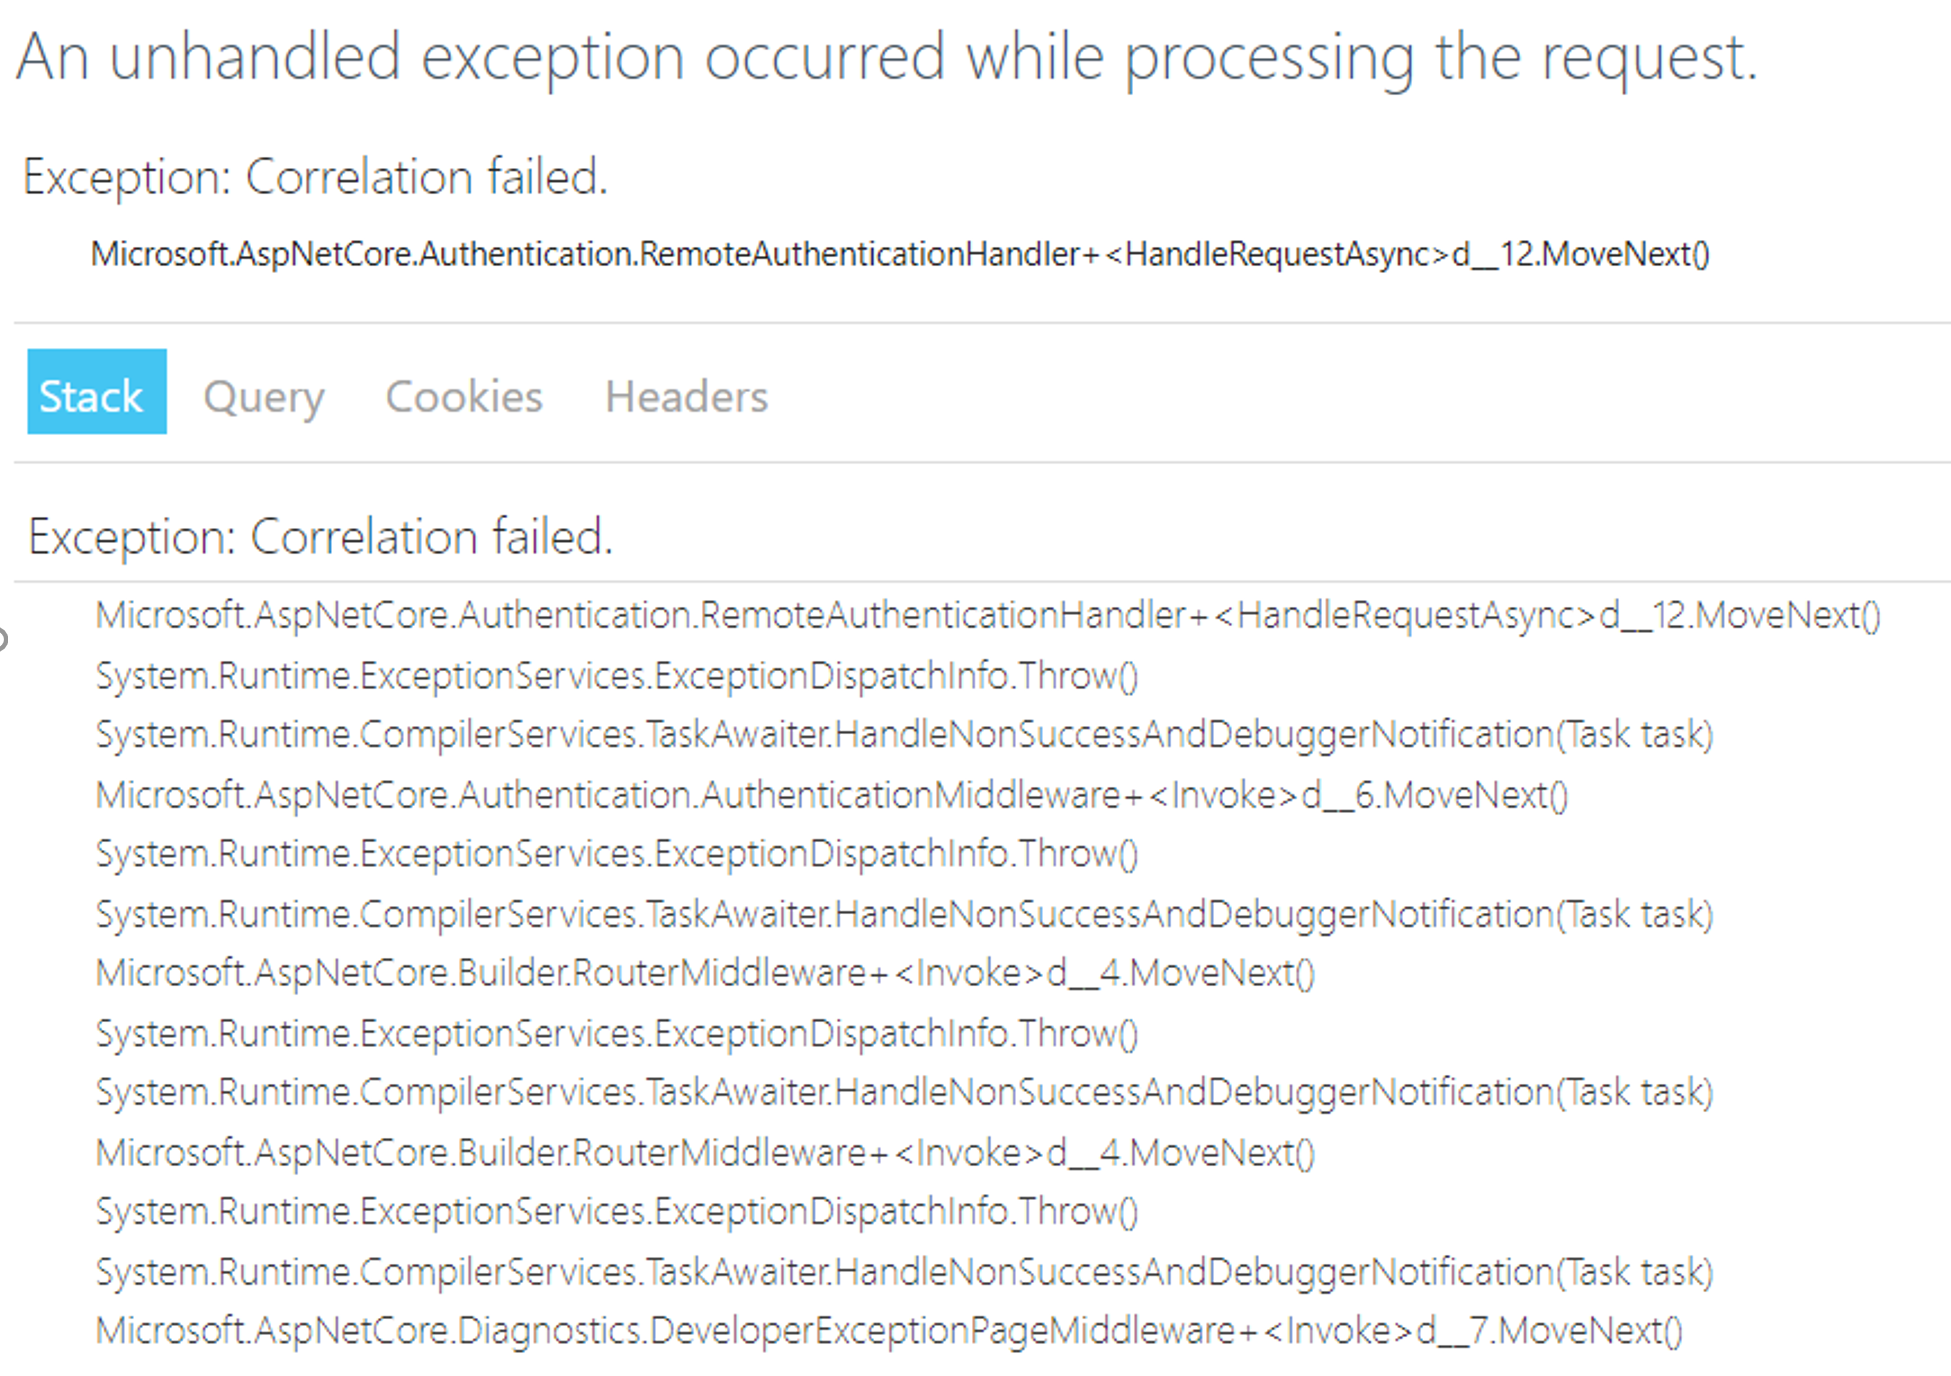 Correlation failed  at Microsoft AspNetCore Authentication